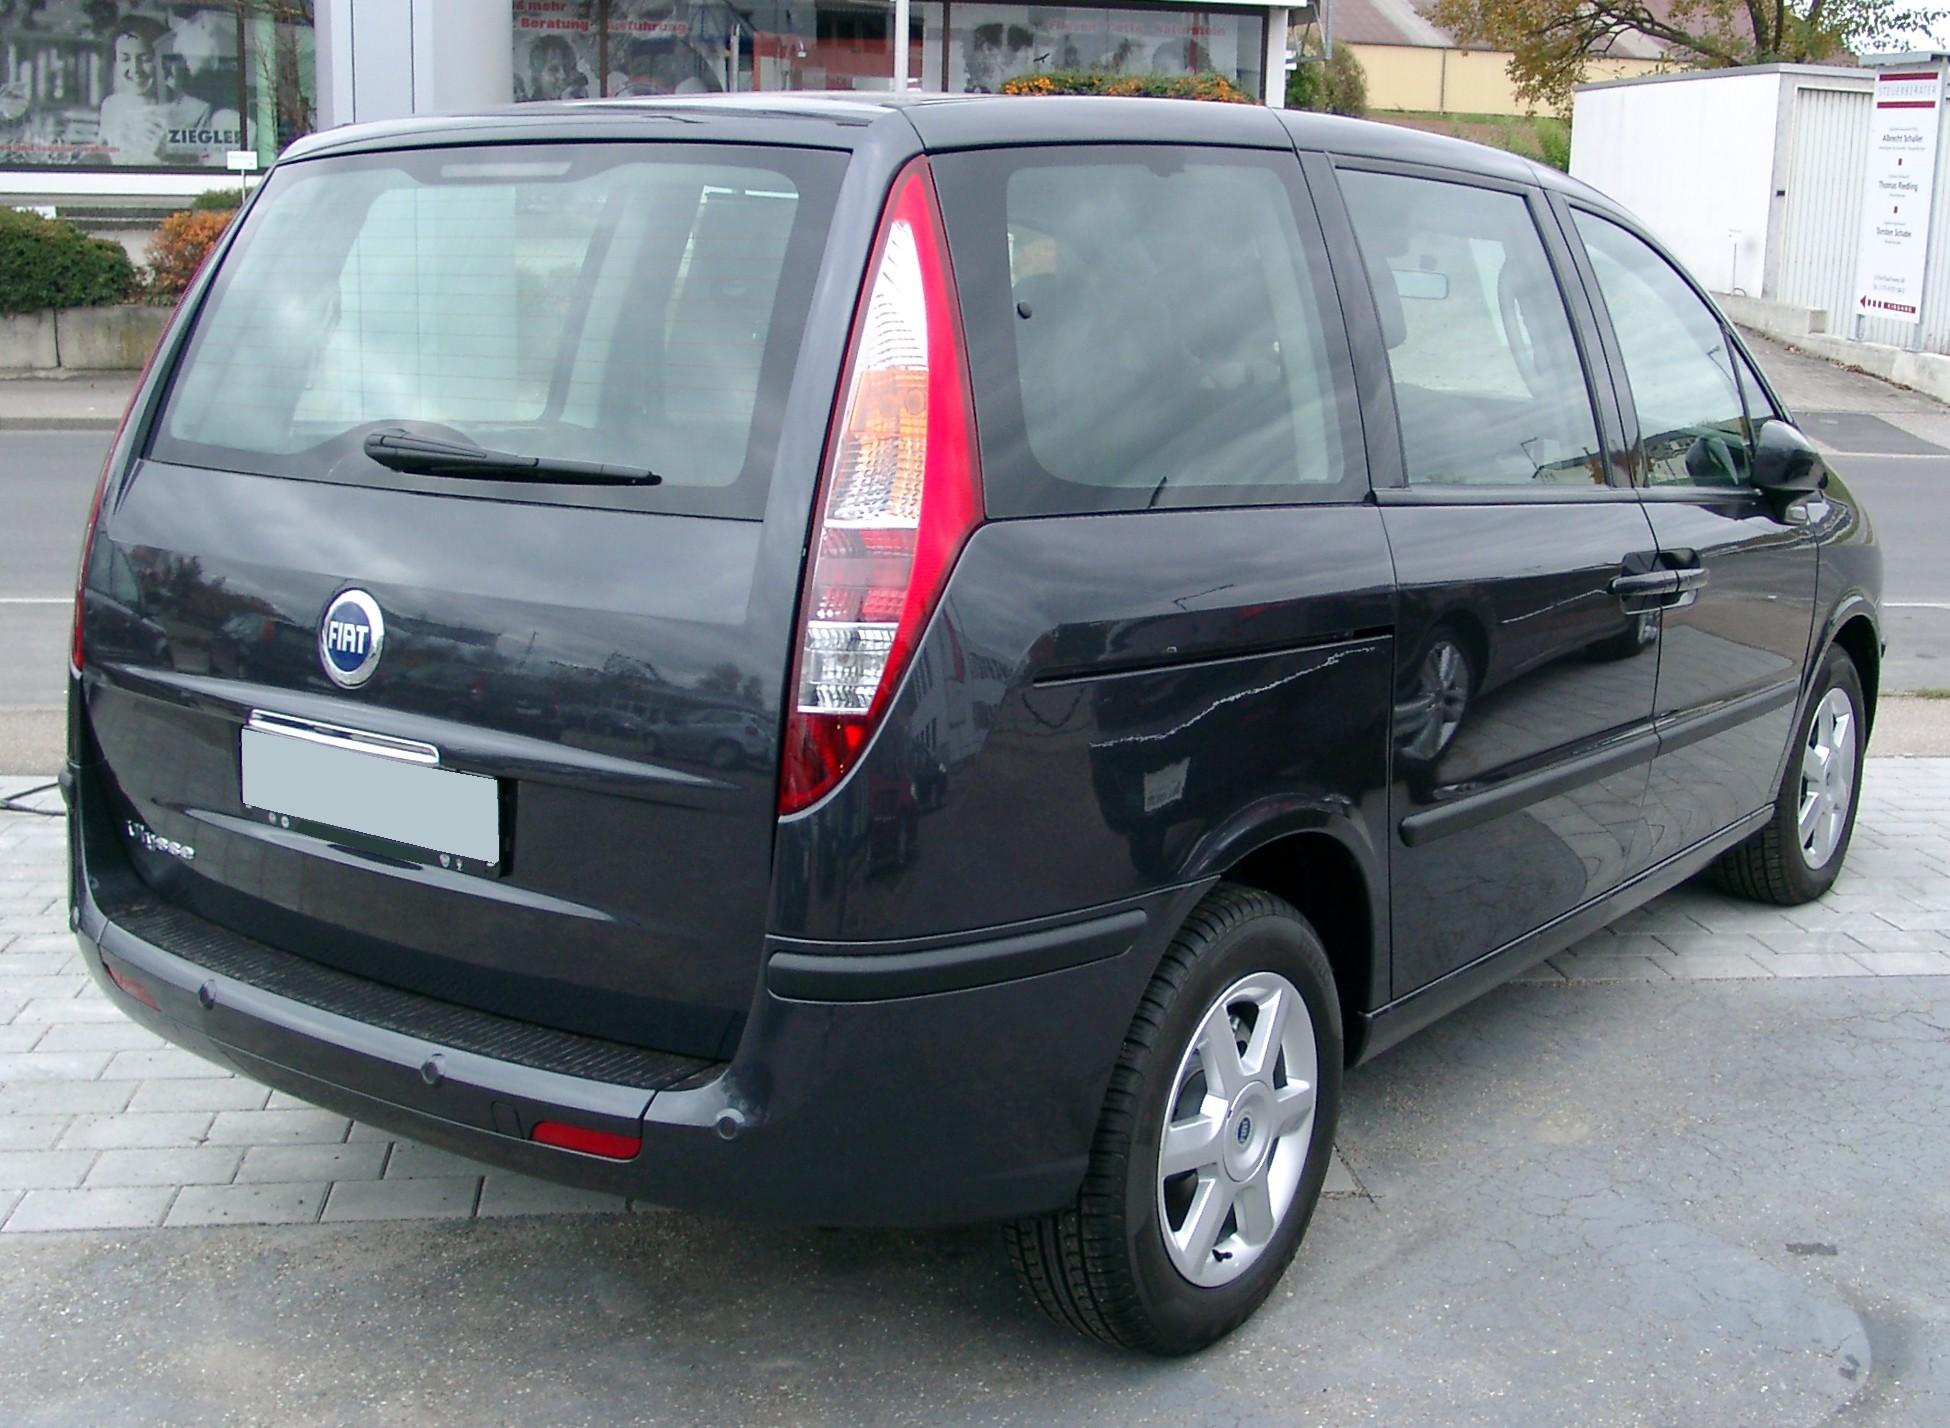 Fiat Ulysse I Restyling 1998 - 2002 Compact MPV #3